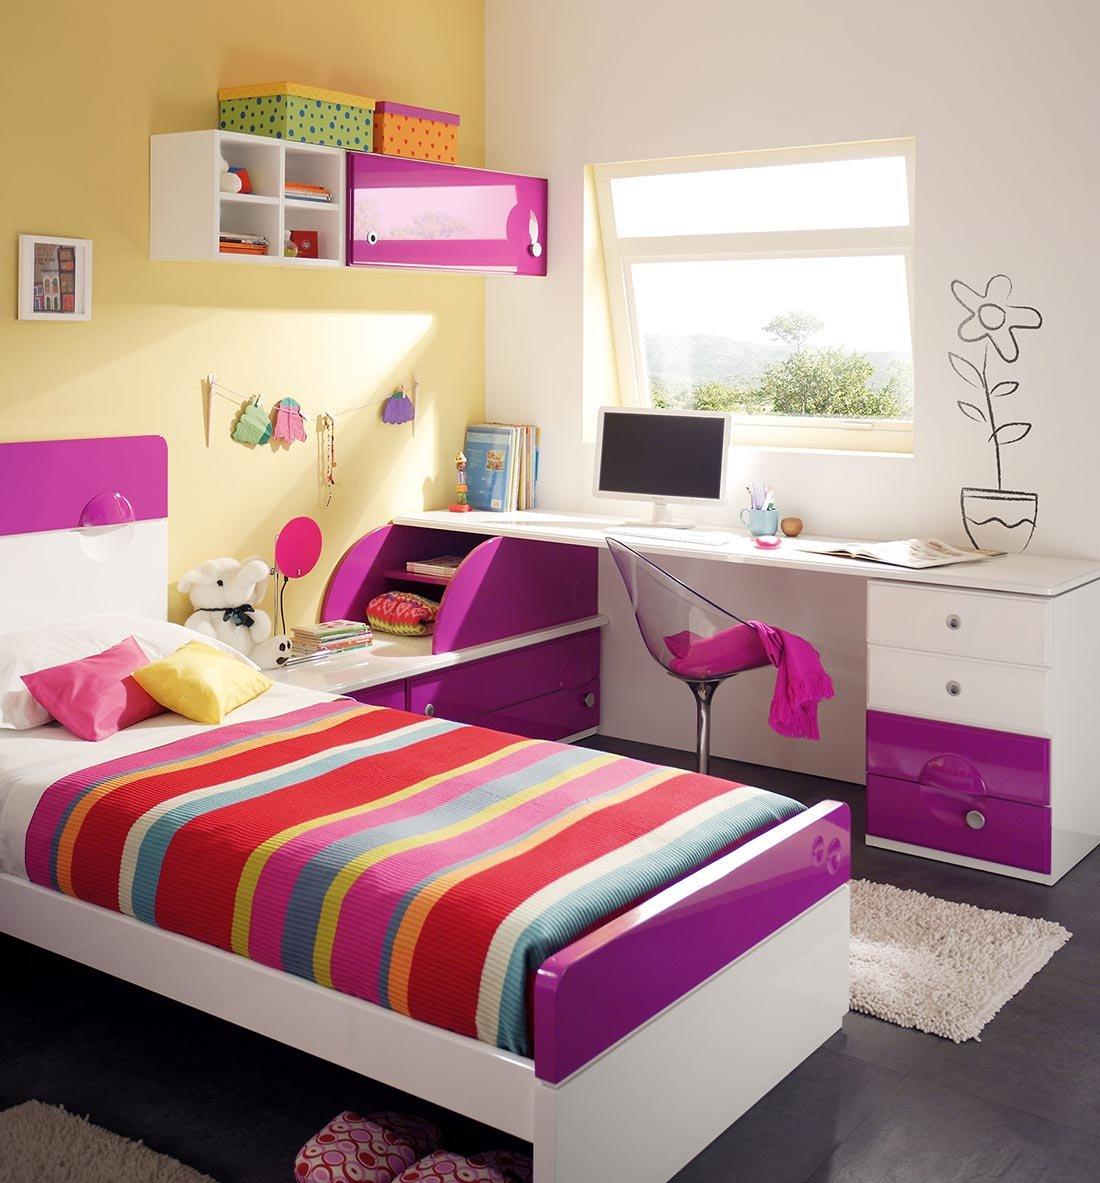 Habitaciones juveniles de la firma juraco decoraci n del - Habitaciones decoradas juveniles ...